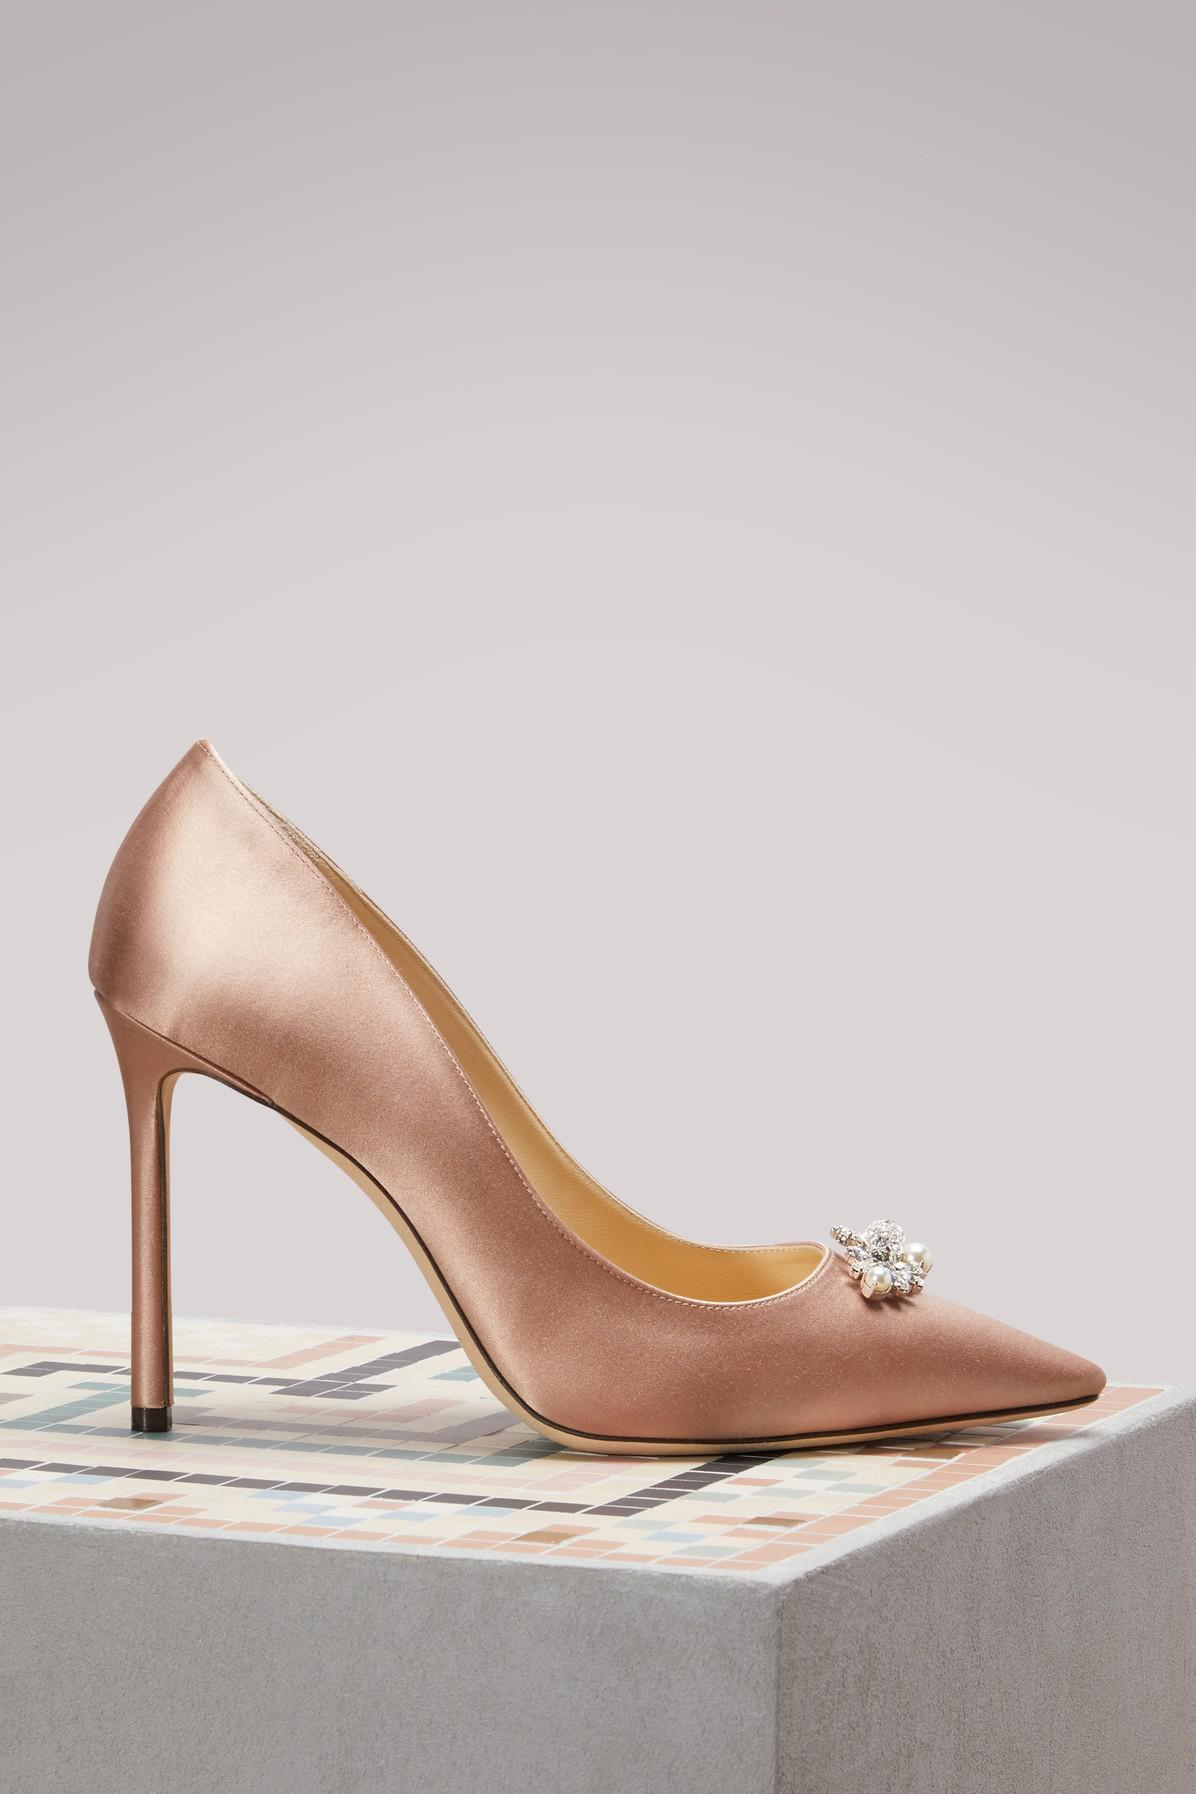 997a709e8829 Jimmy Choo. Women s Pink Alexa 100 Satin Court Shoes